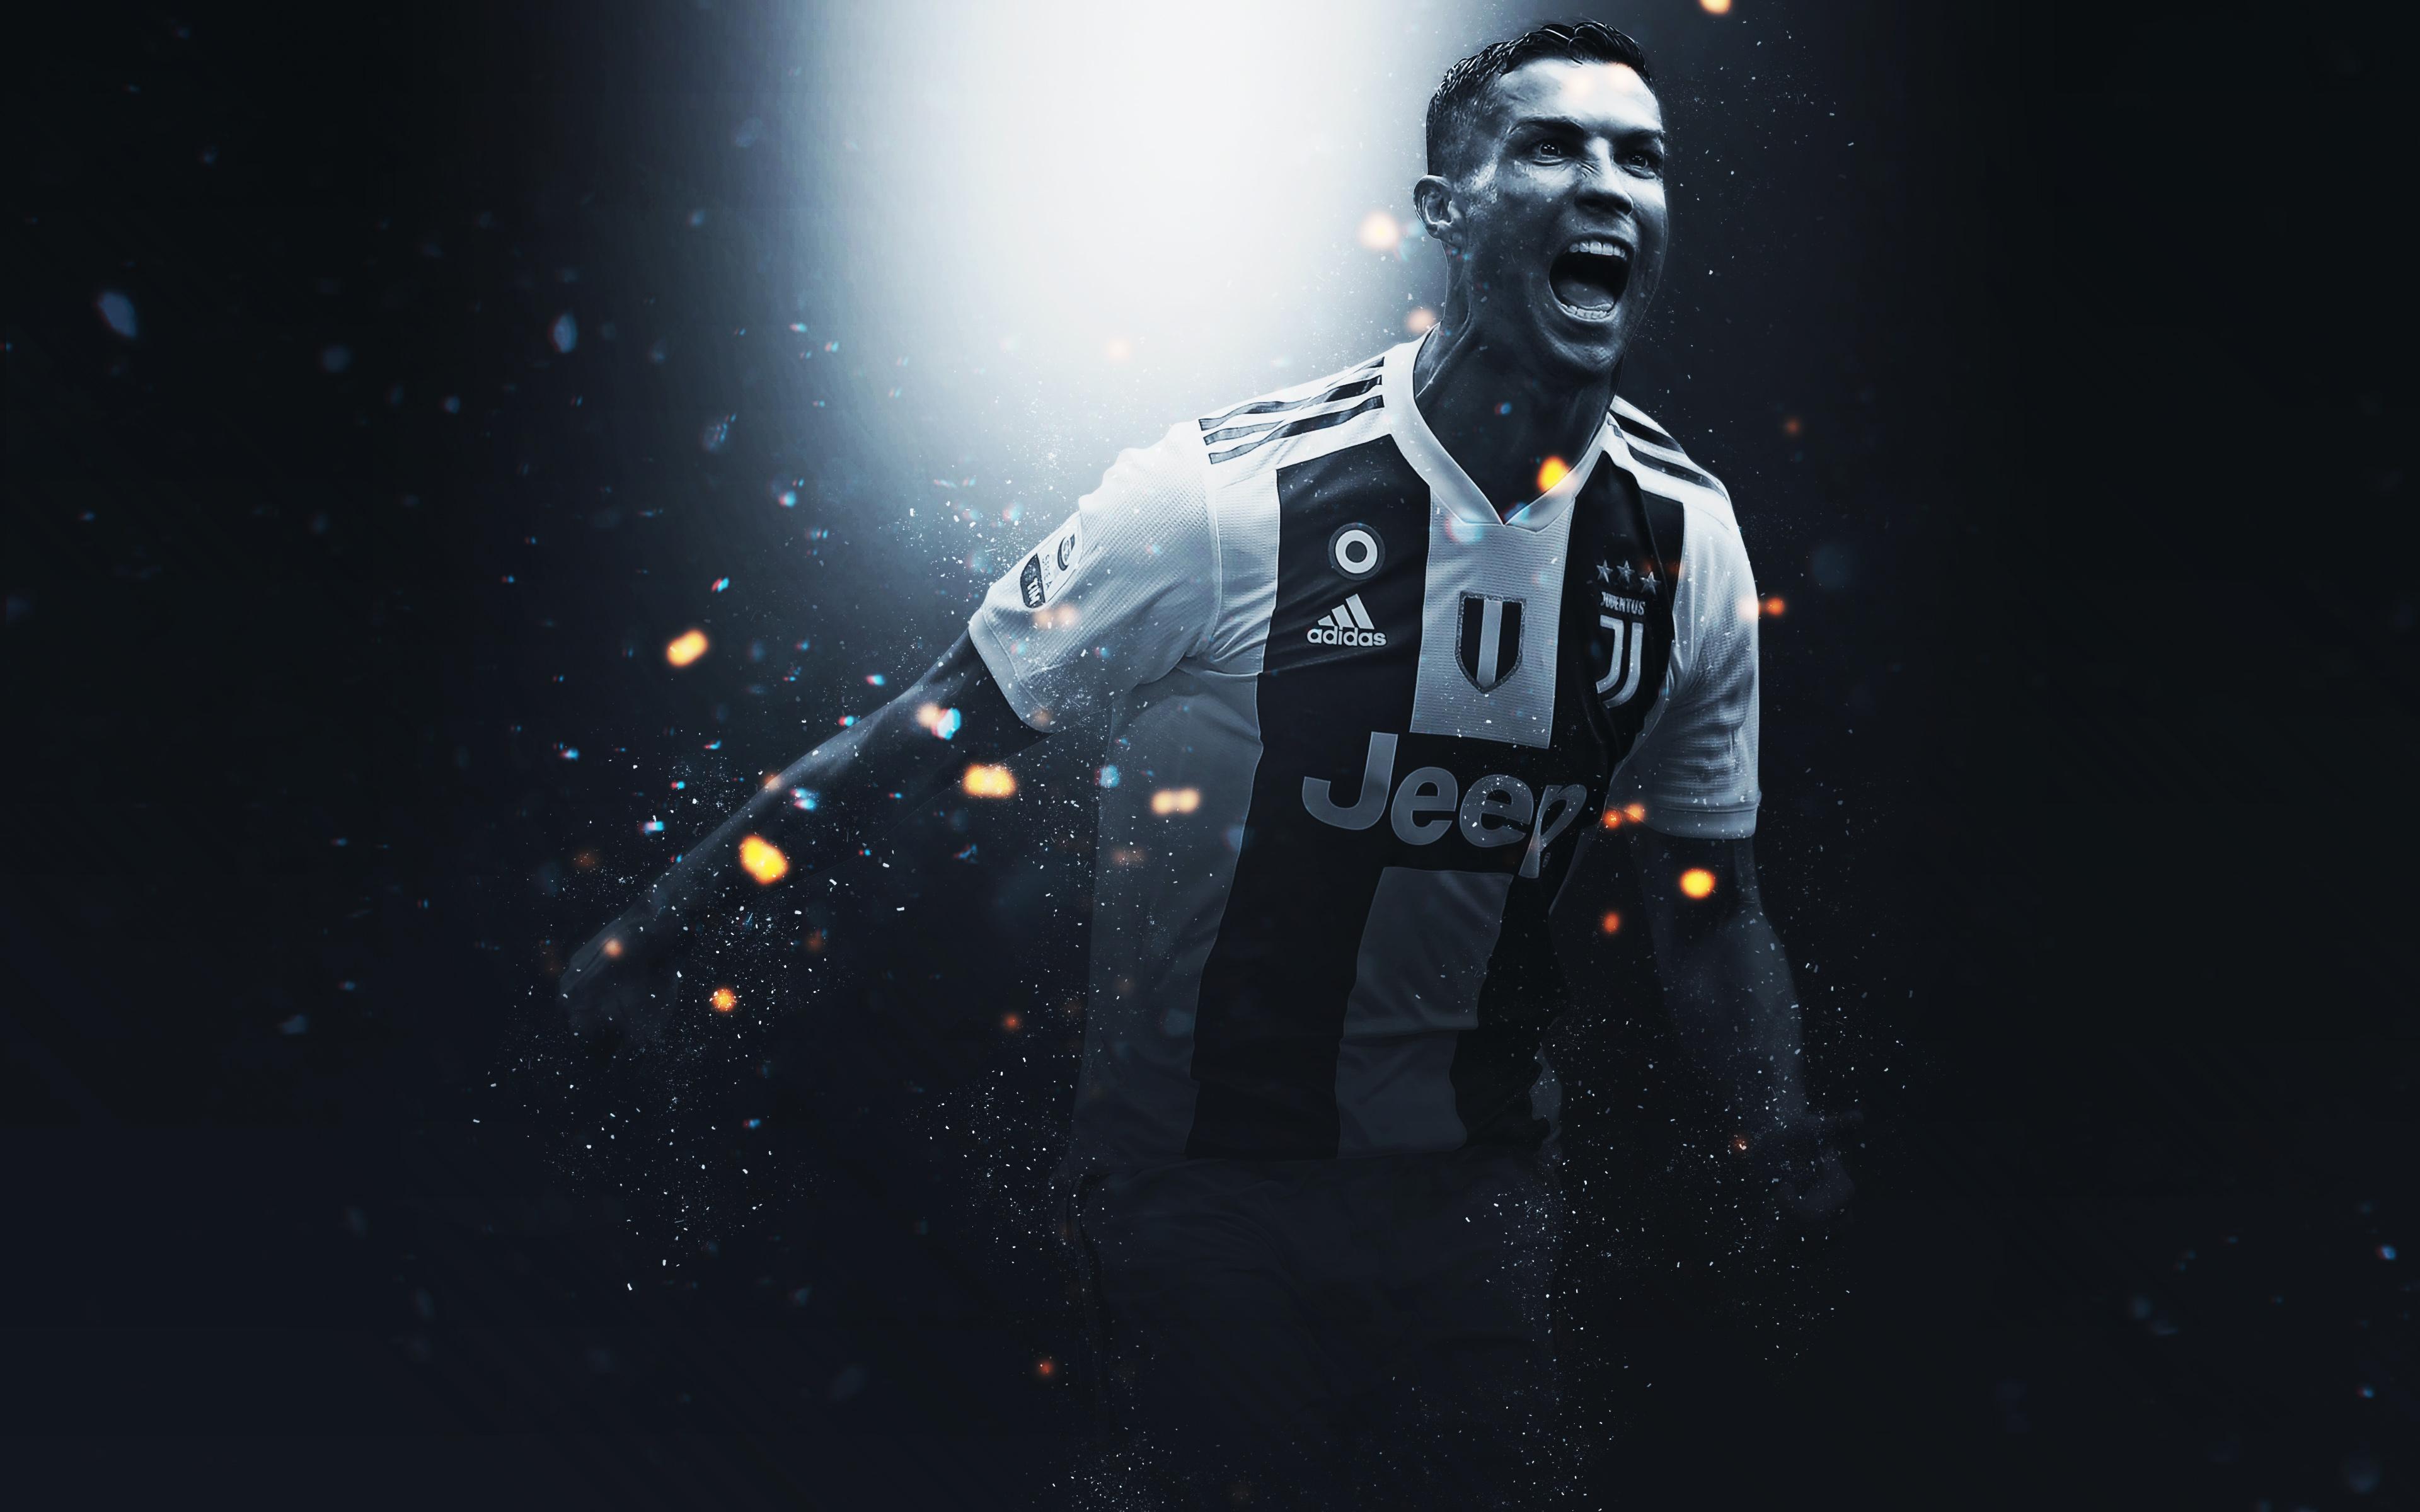 1920x1080 Cristiano Ronaldo Juventus FC Laptop Full HD